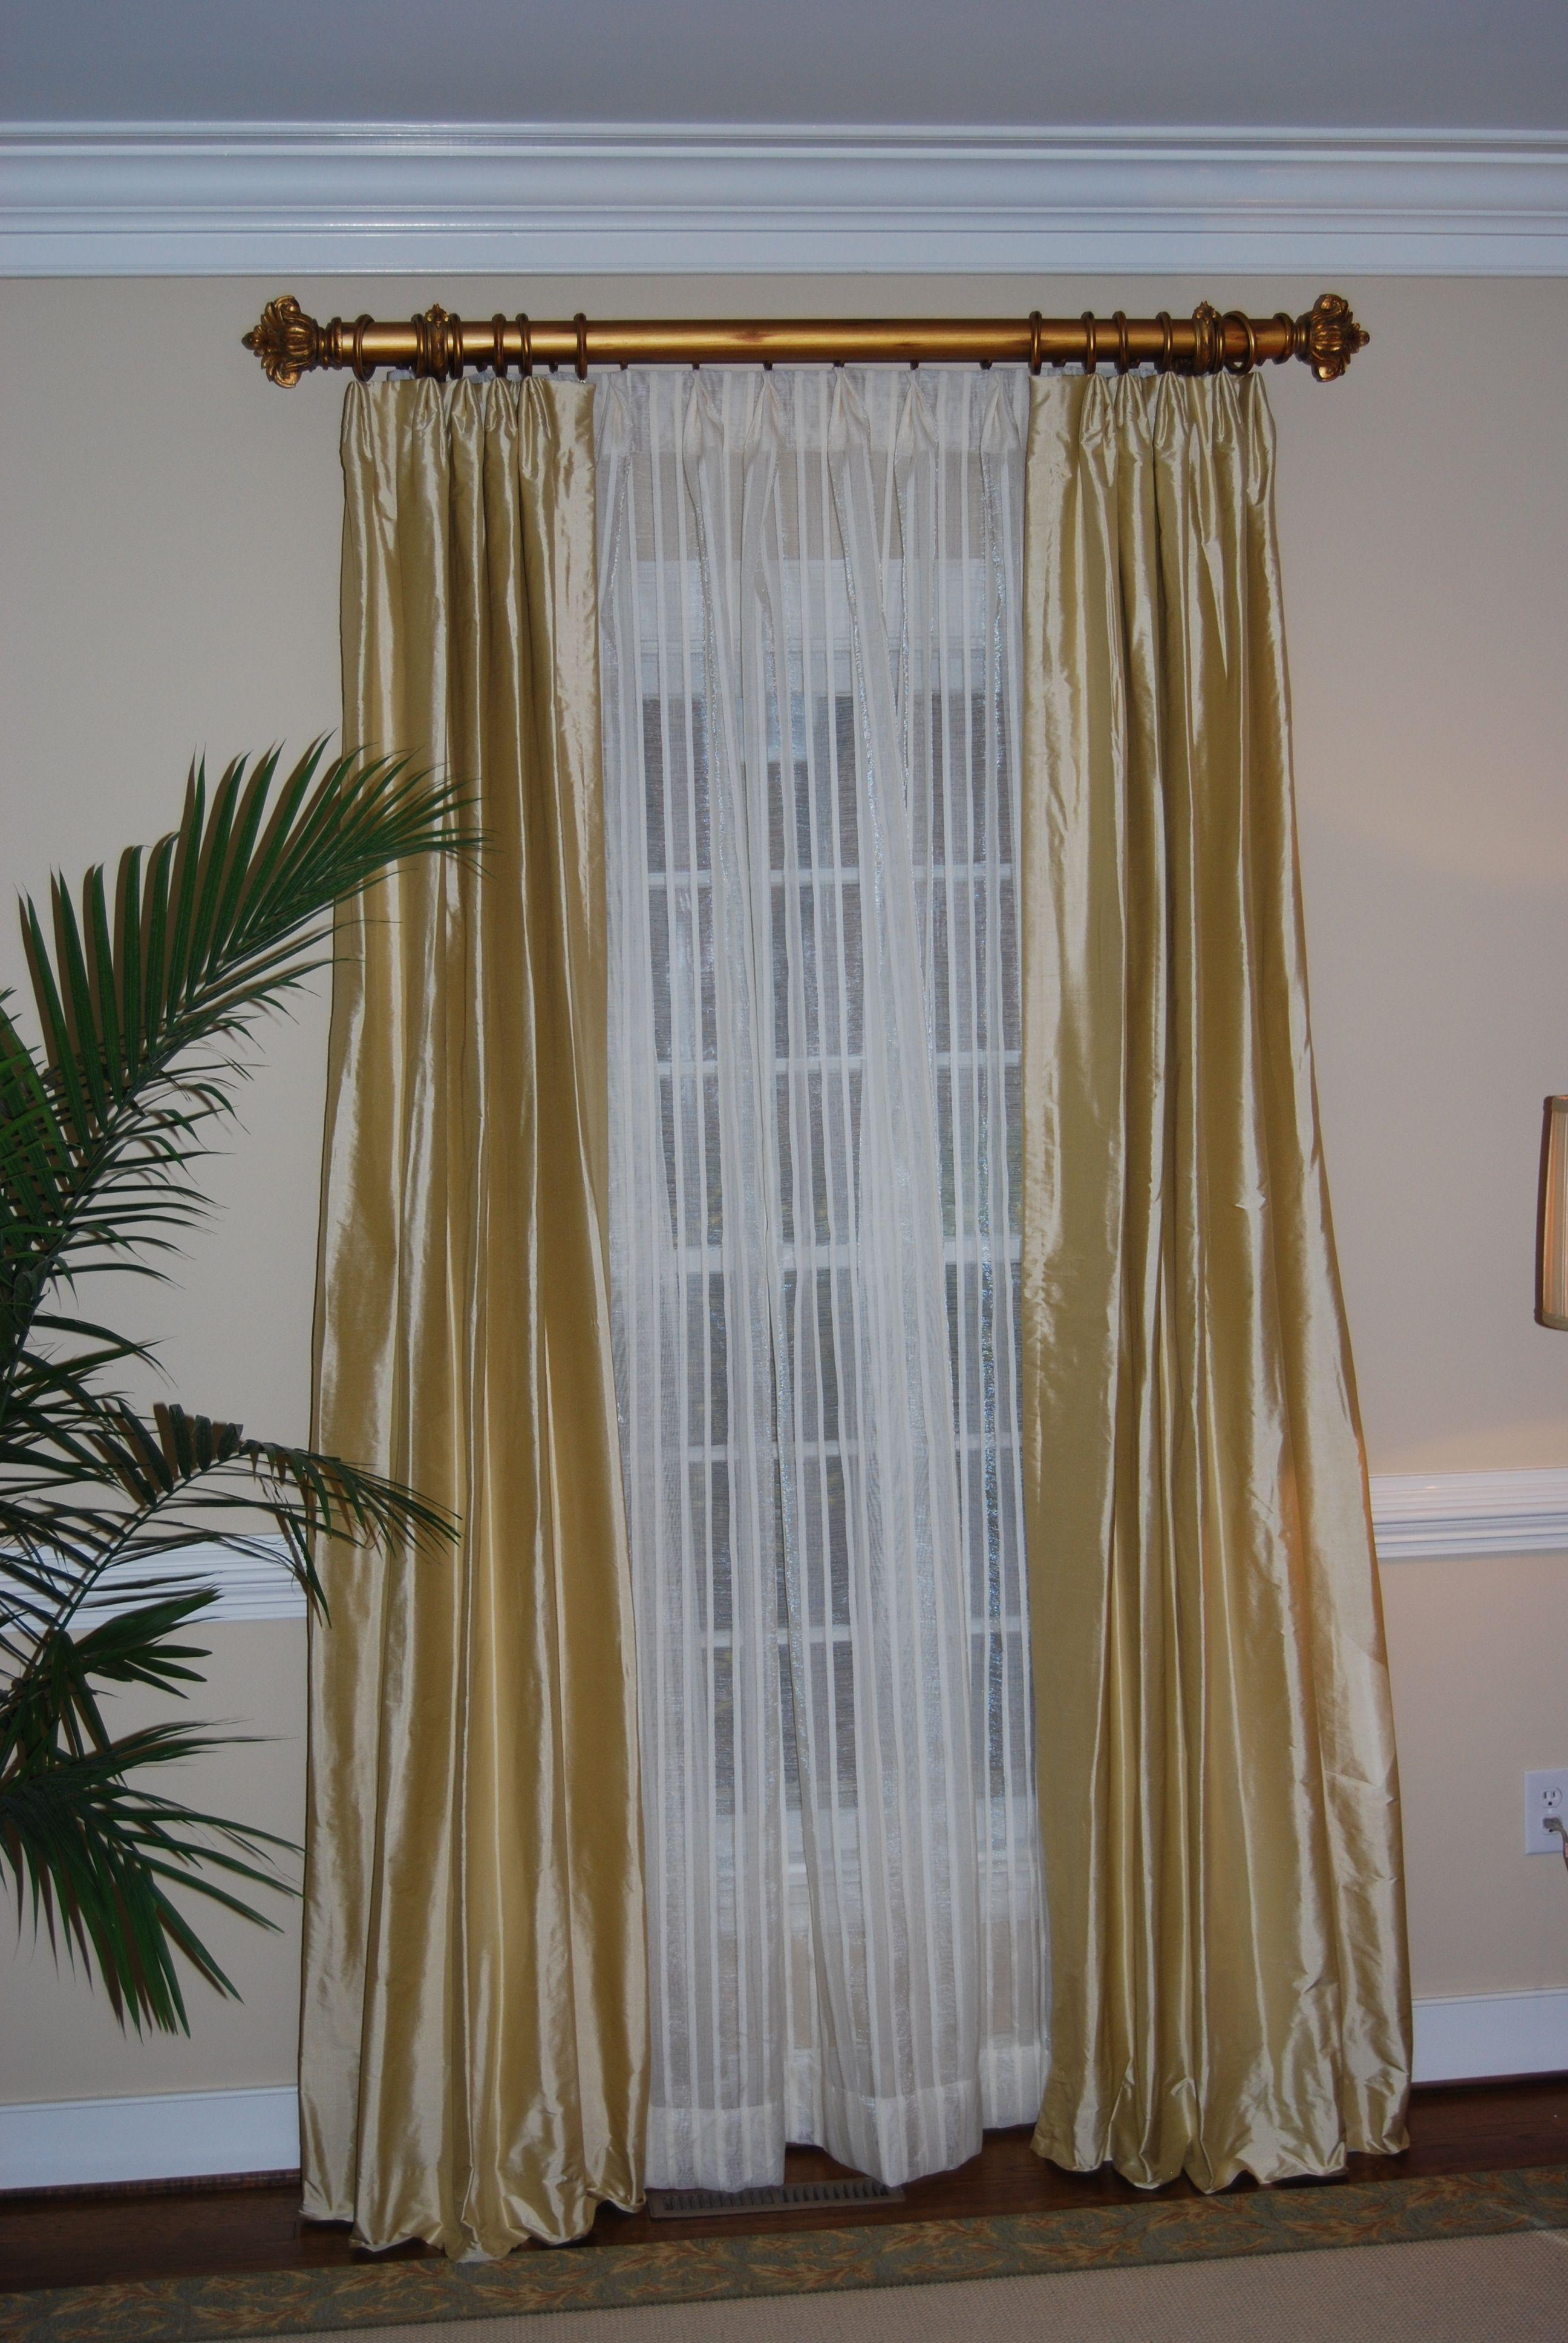 Double Rod Panels W Sheers Behind Window Treatments